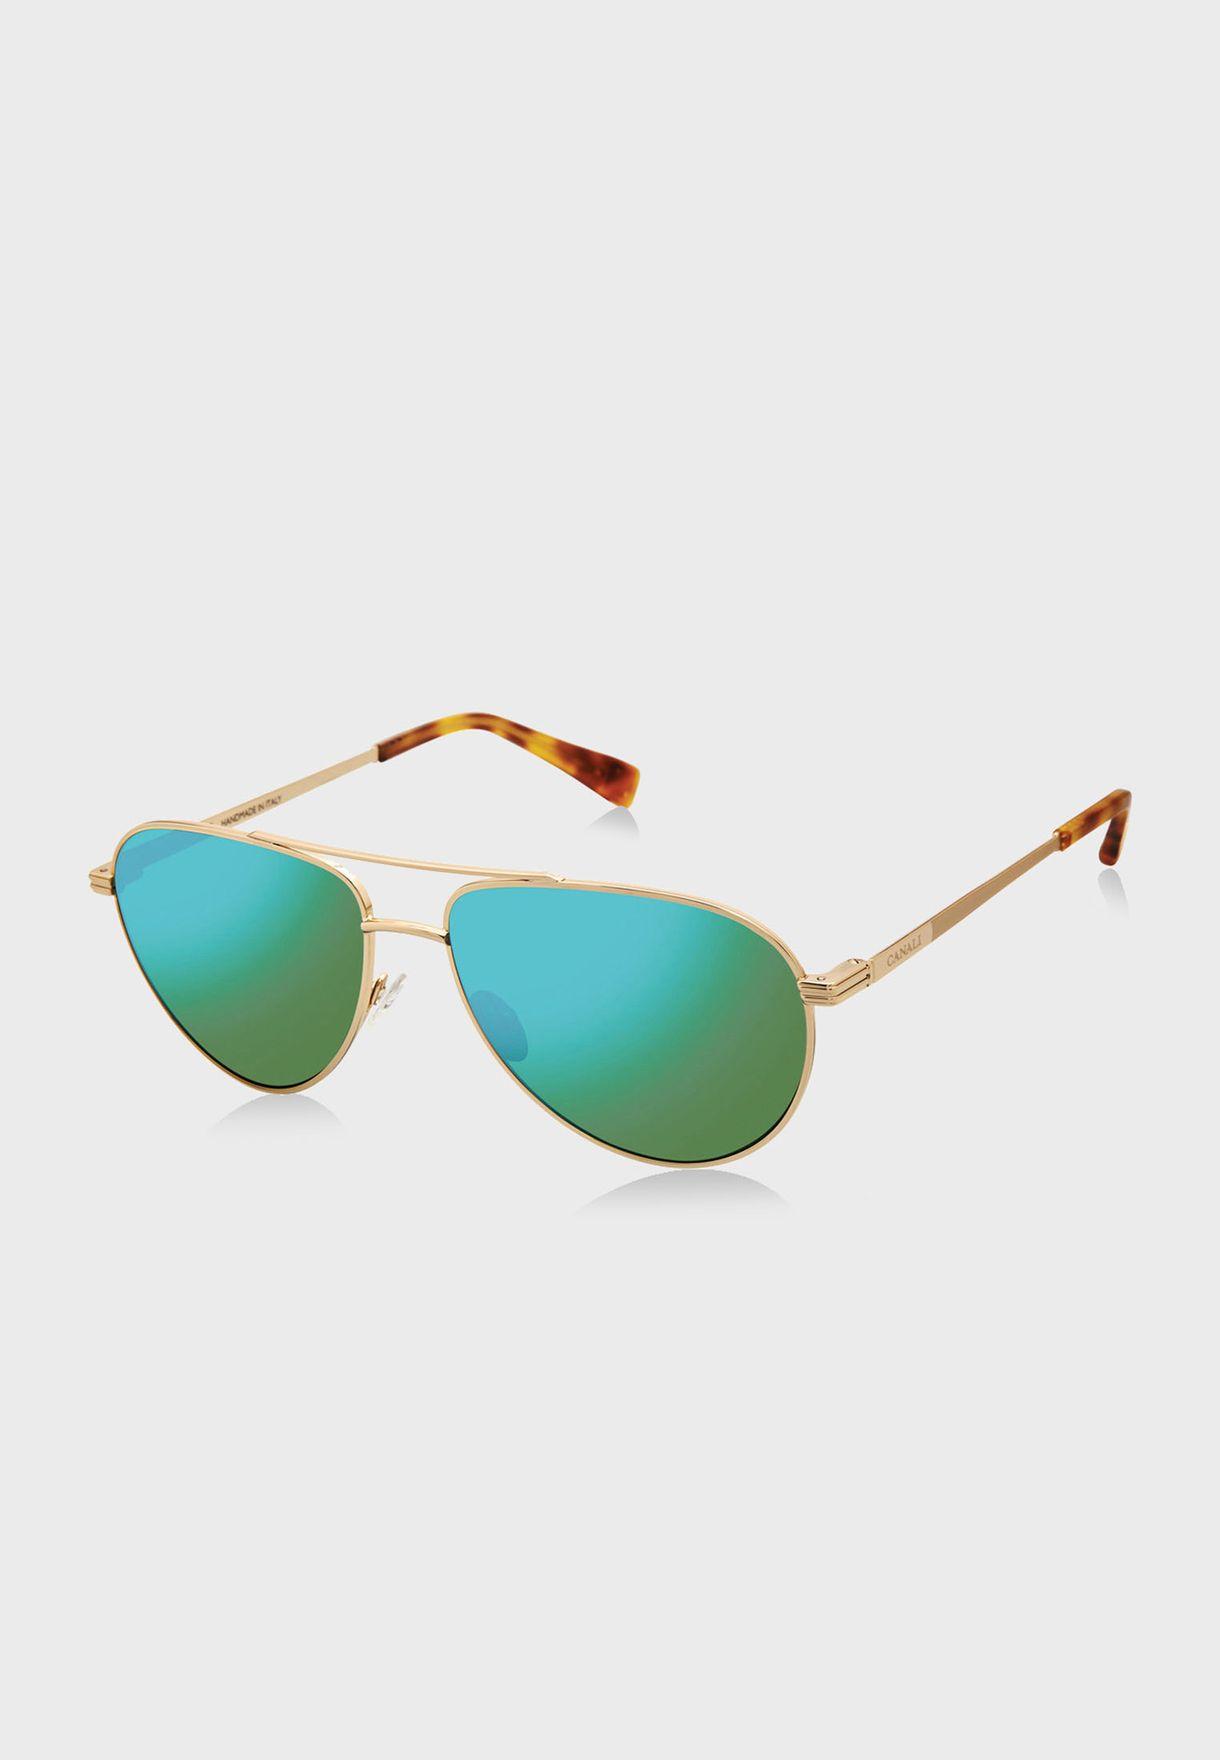 L CO20402 Aviator Sunglasses